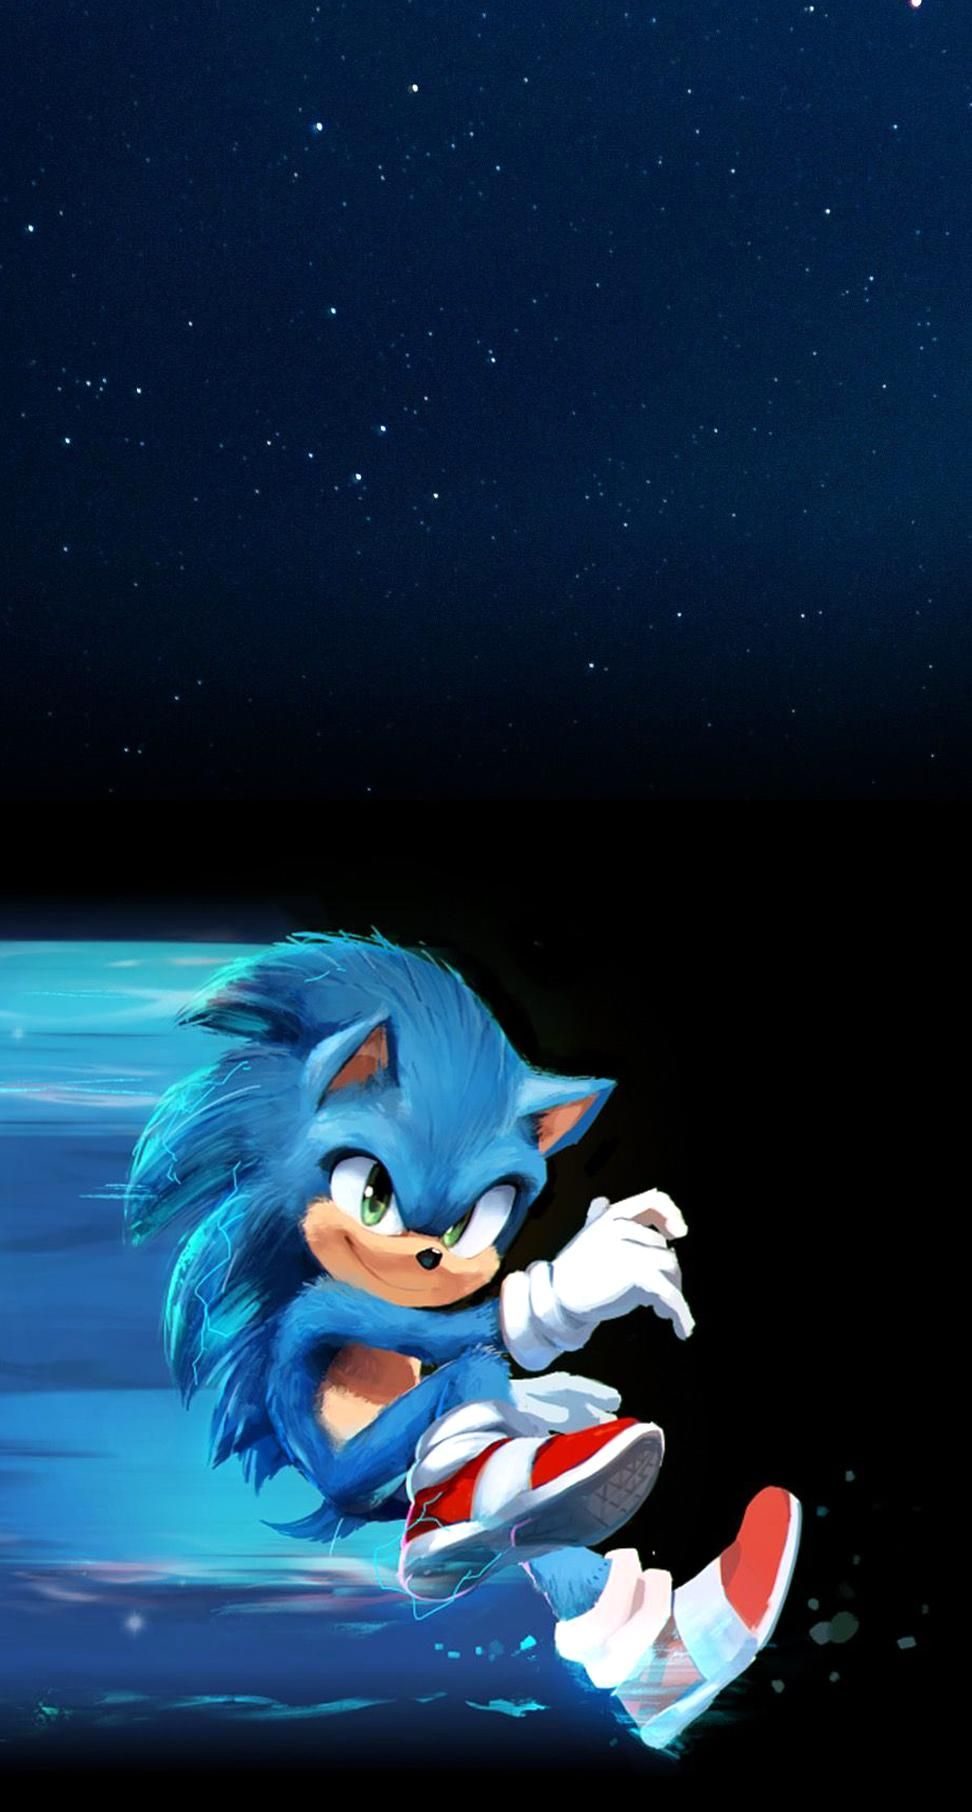 Wallpaper IPhone SEGAs Sonic the Hedgehog MOVIE in 2020